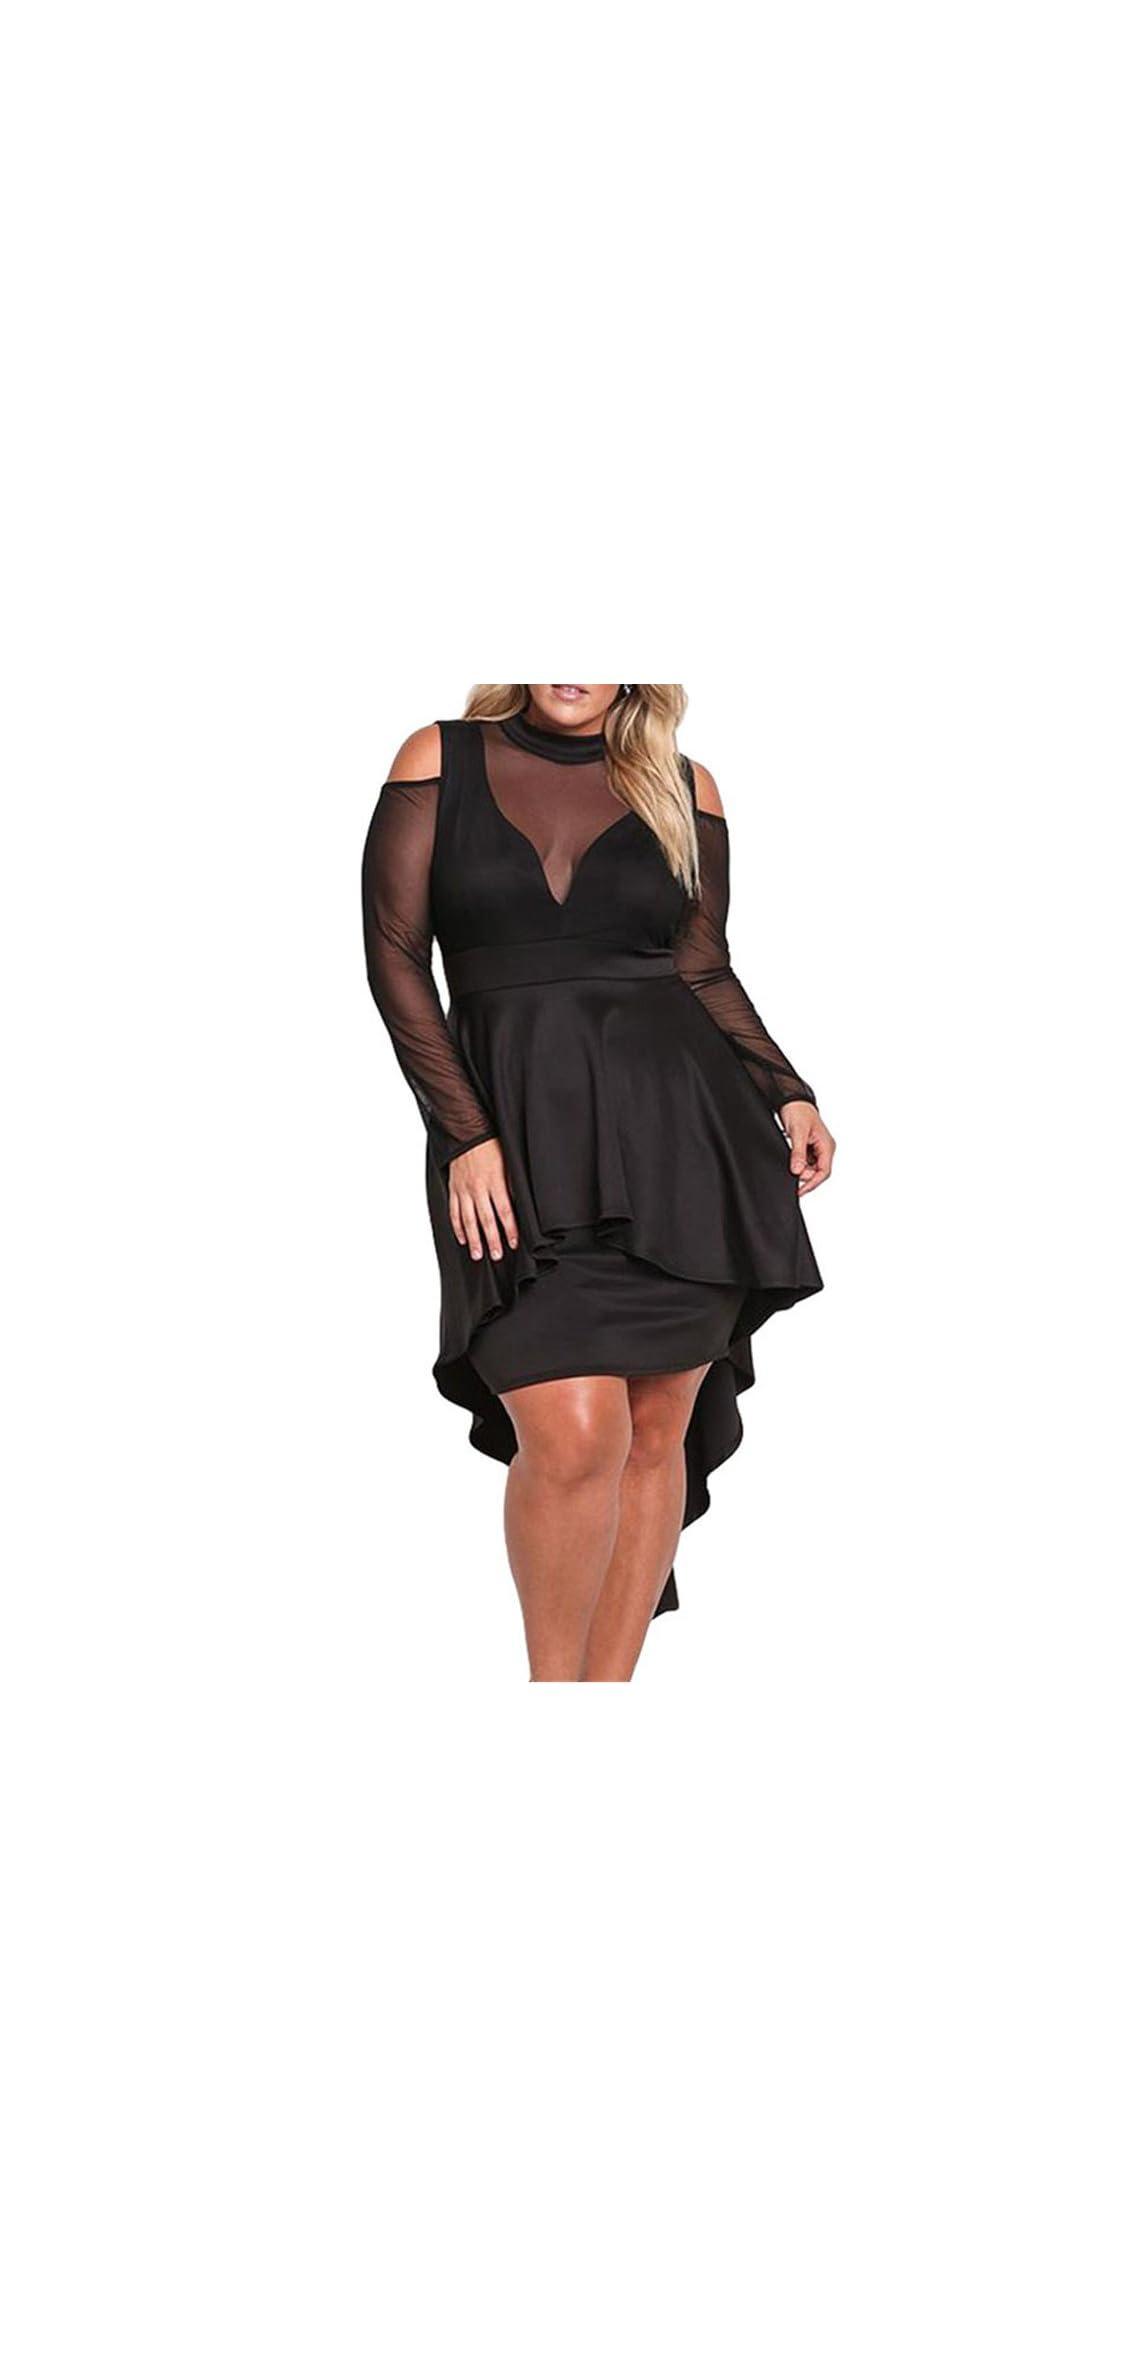 Women's Sexy Sheer Mesh Evening Gowns Plus Size Peplum